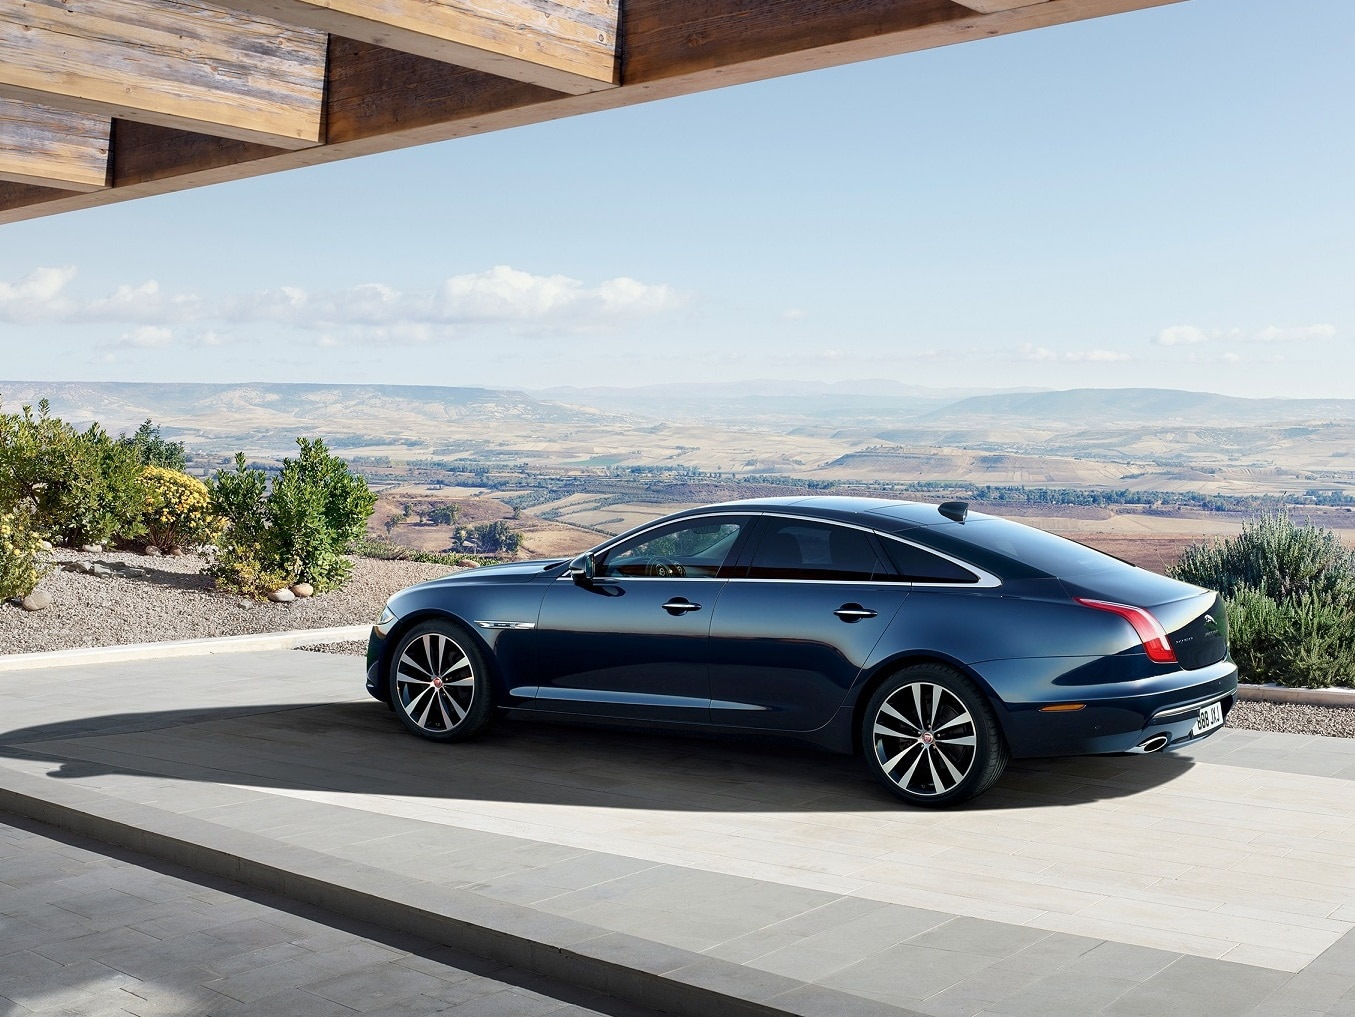 2019 Jaguar Xj50 Launched At Rs 1 11 Crore Zigwheels